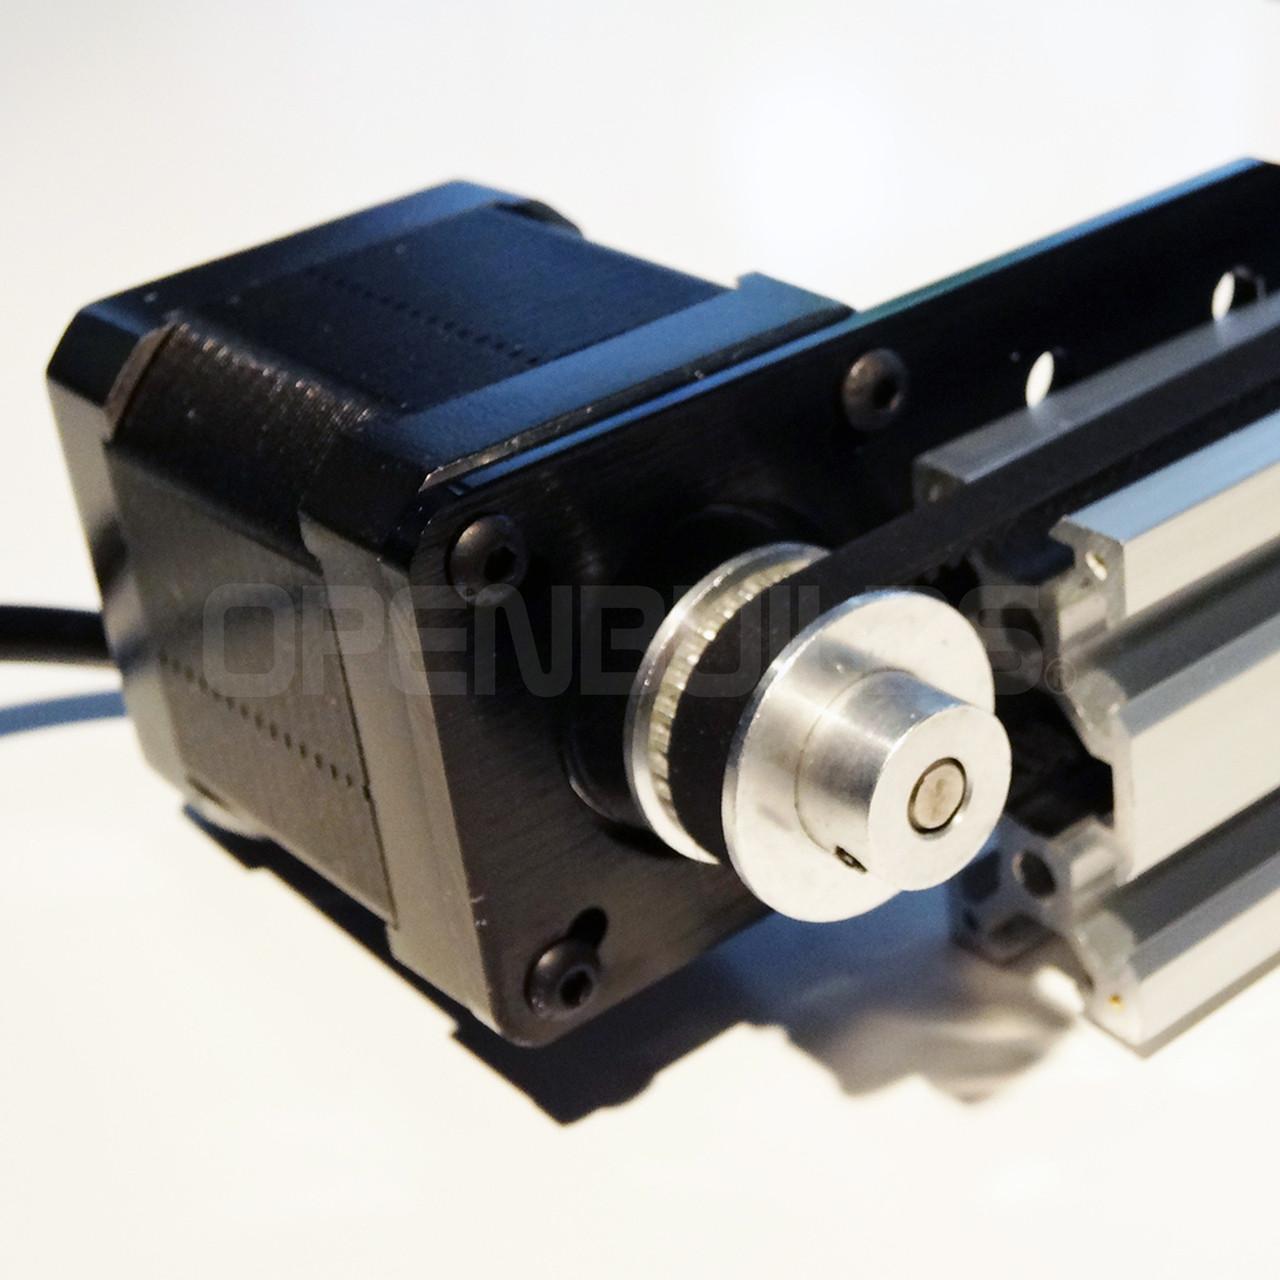 V Slot 174 Nema 17 Linear Actuator Bundle Belt Driven